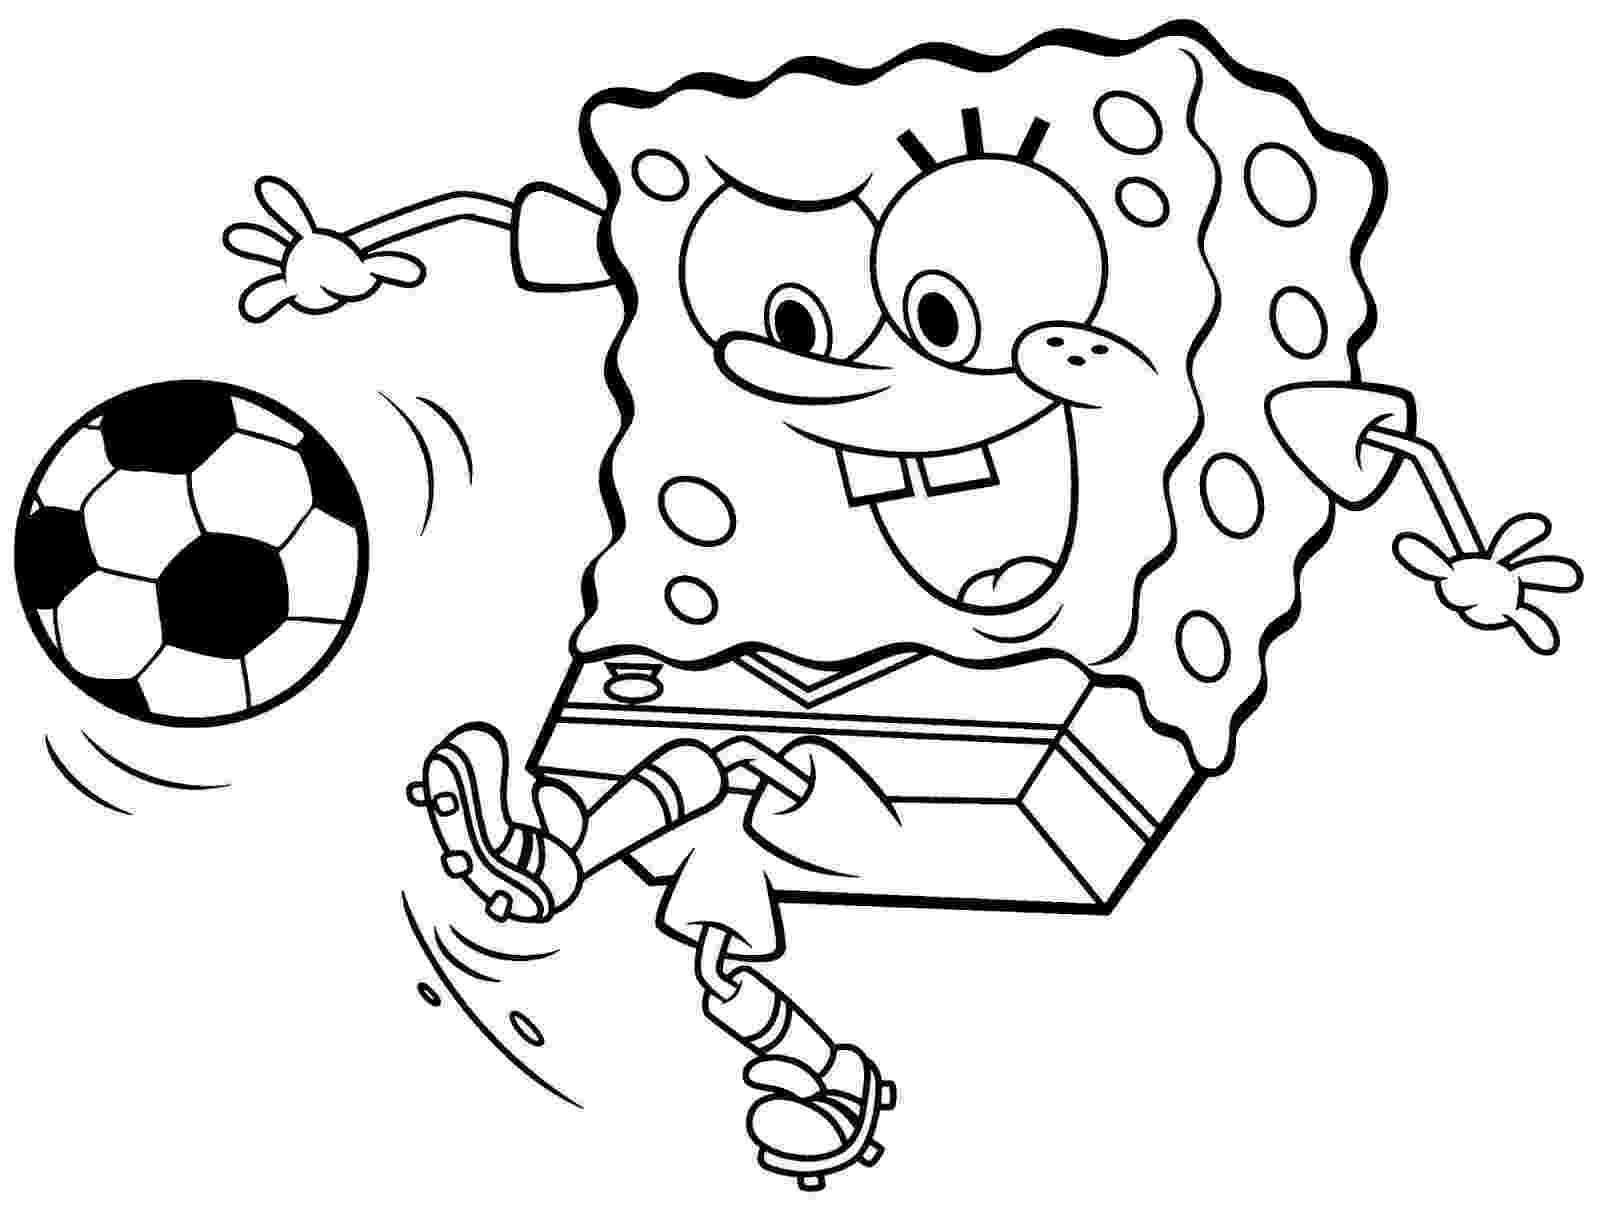 spongebob coloring sheet printable spongebob coloring pages for kids cool2bkids spongebob coloring sheet